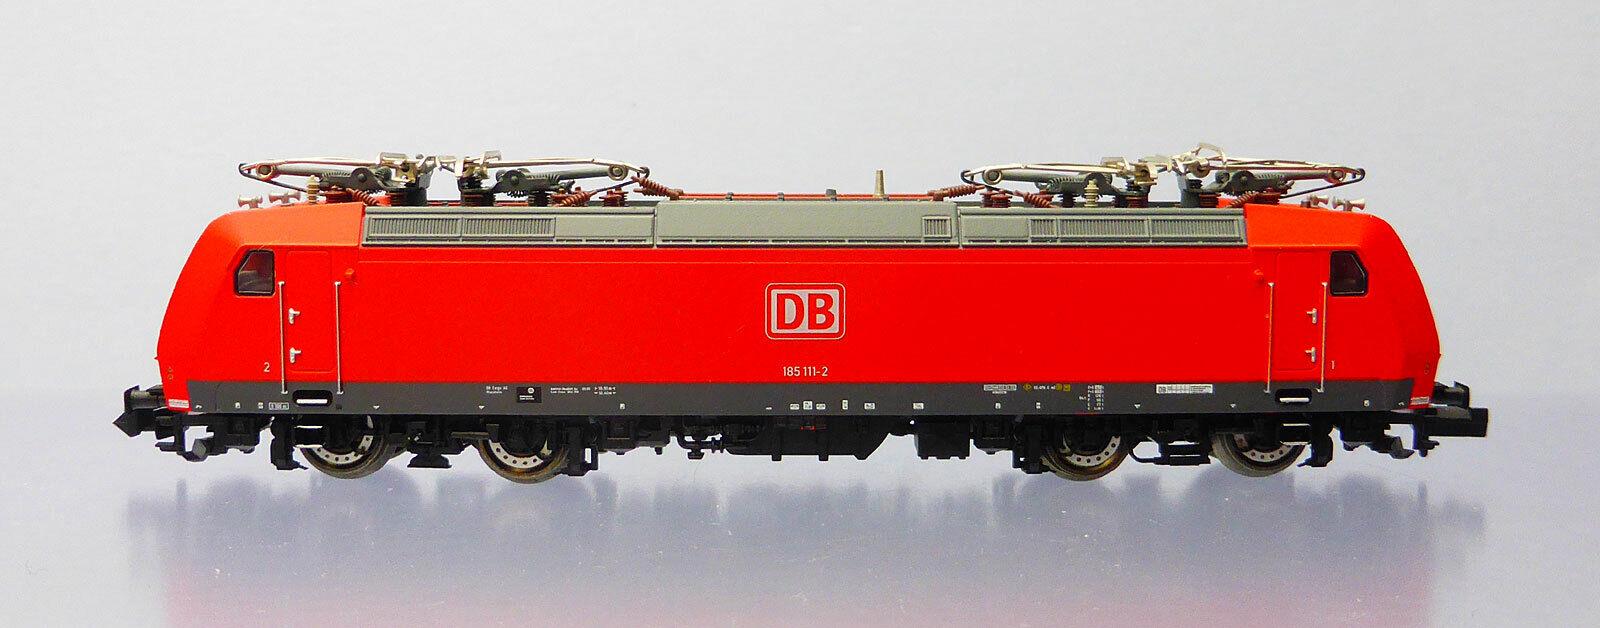 Fleischmann n 7385; ellok 185 111-2 DB, DSS, sin usar en OVP j120